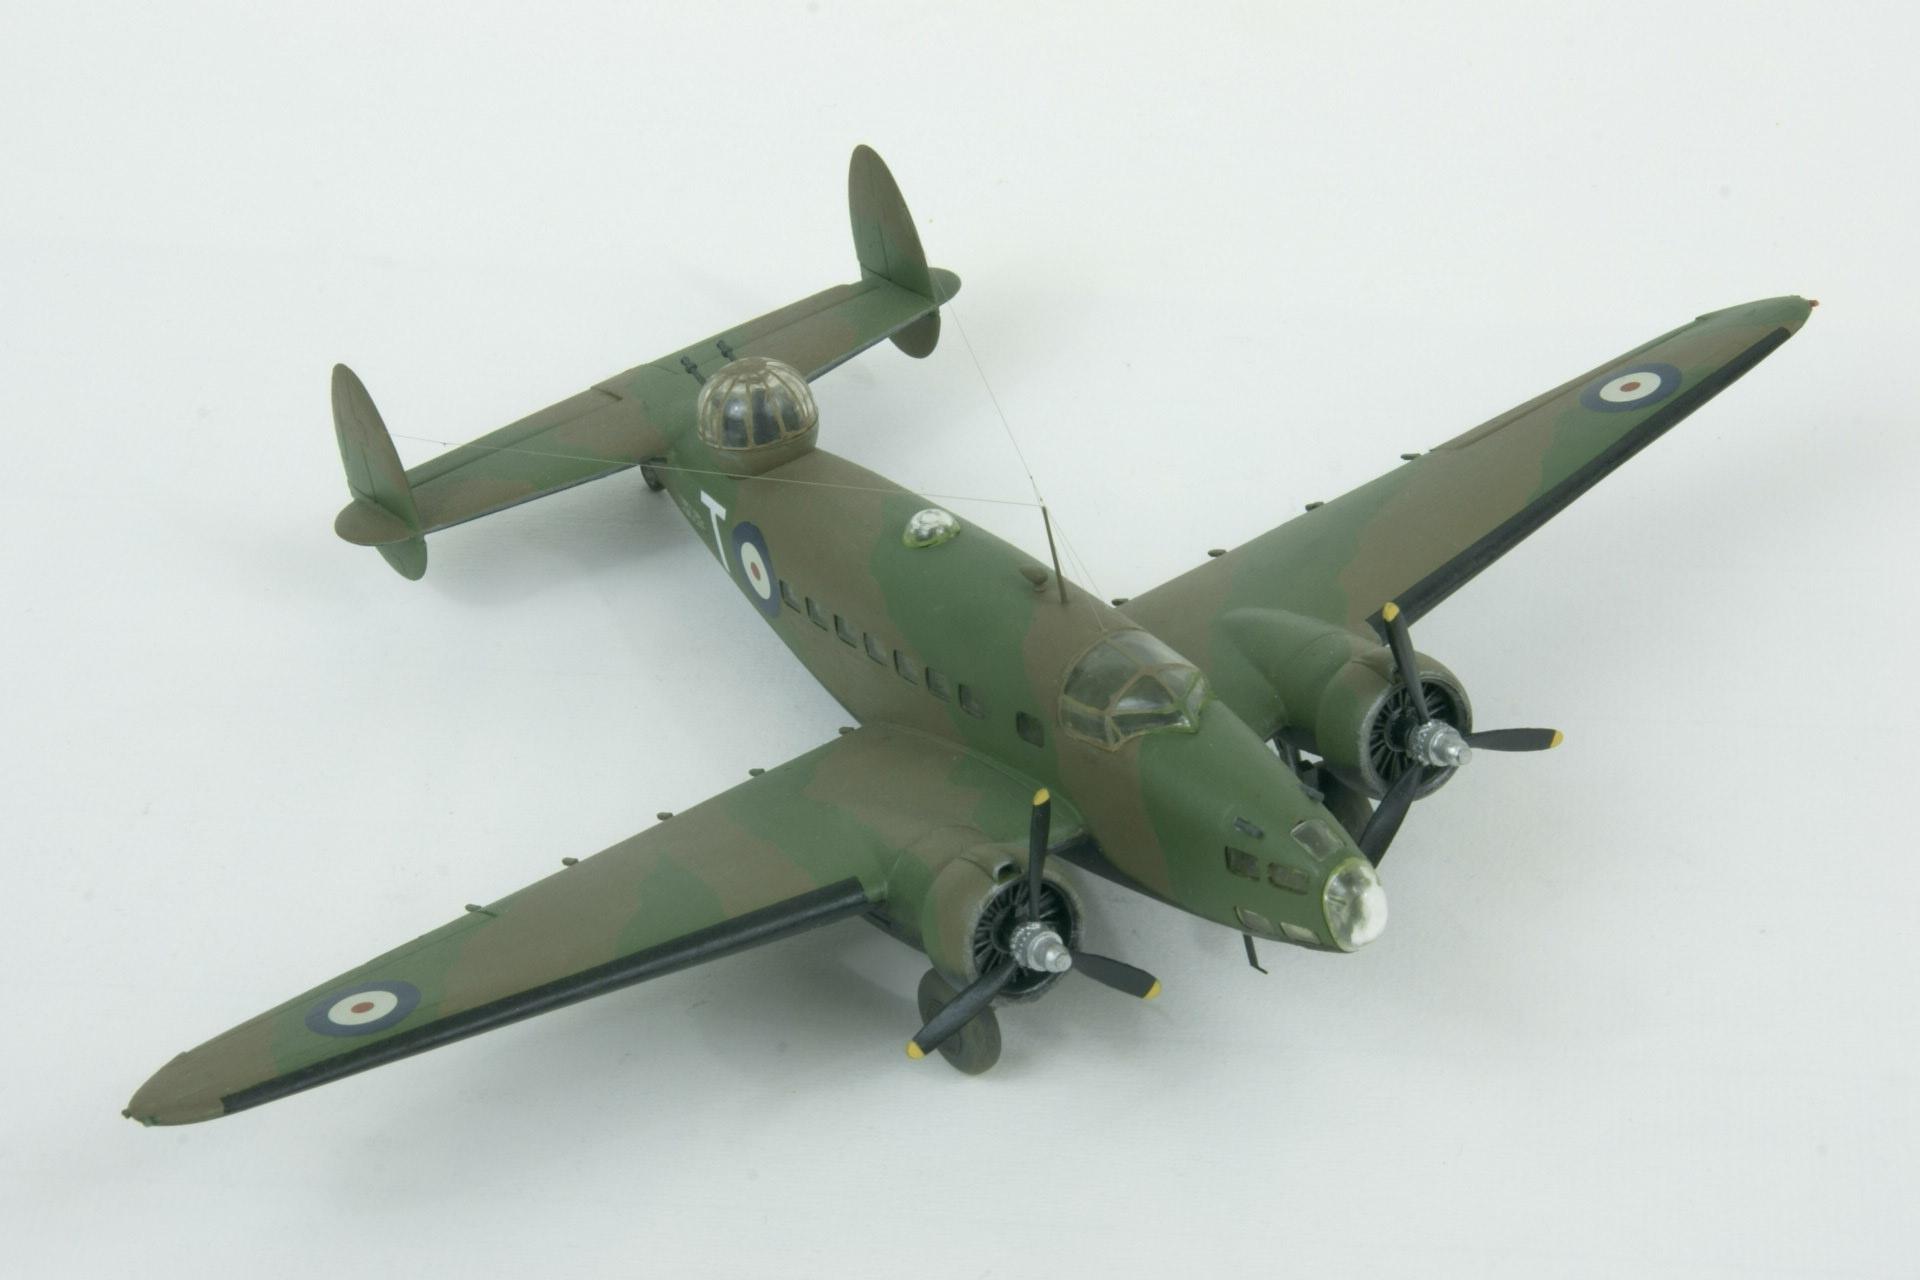 Lockheed hudson 9